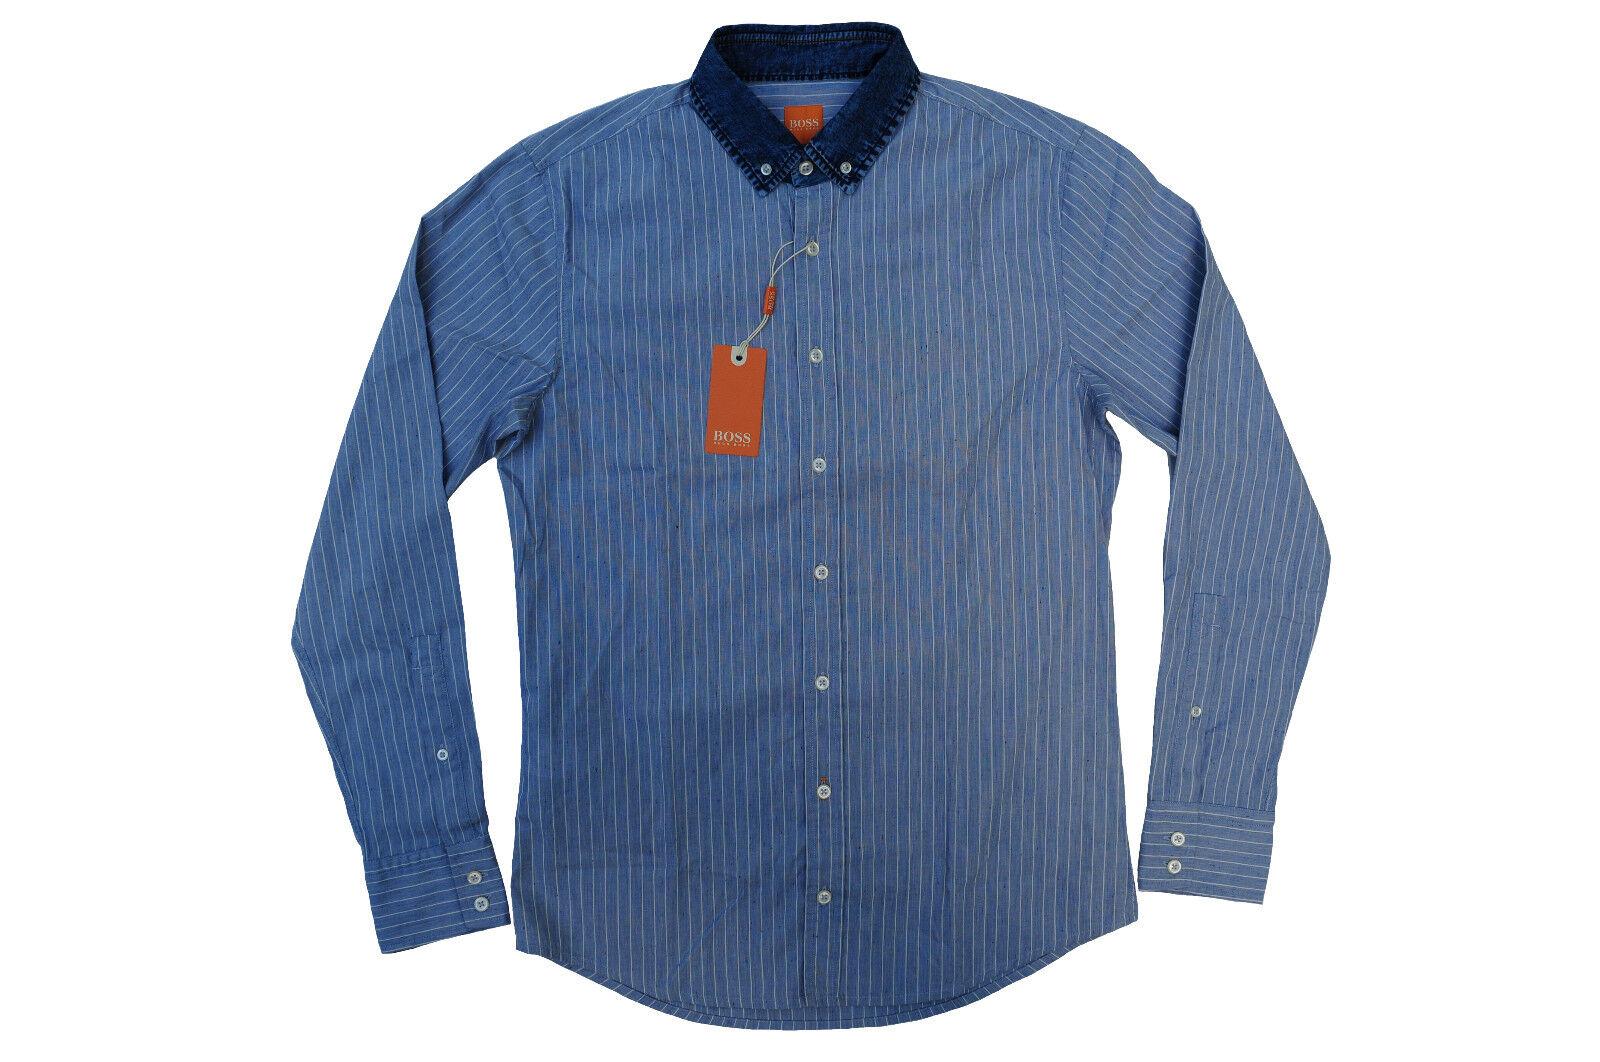 NEU gr. M HUGO BOSS Orange HEMD JEPREPPY_1 SLIM FIT DARK-Blau zu Jeans 50377866